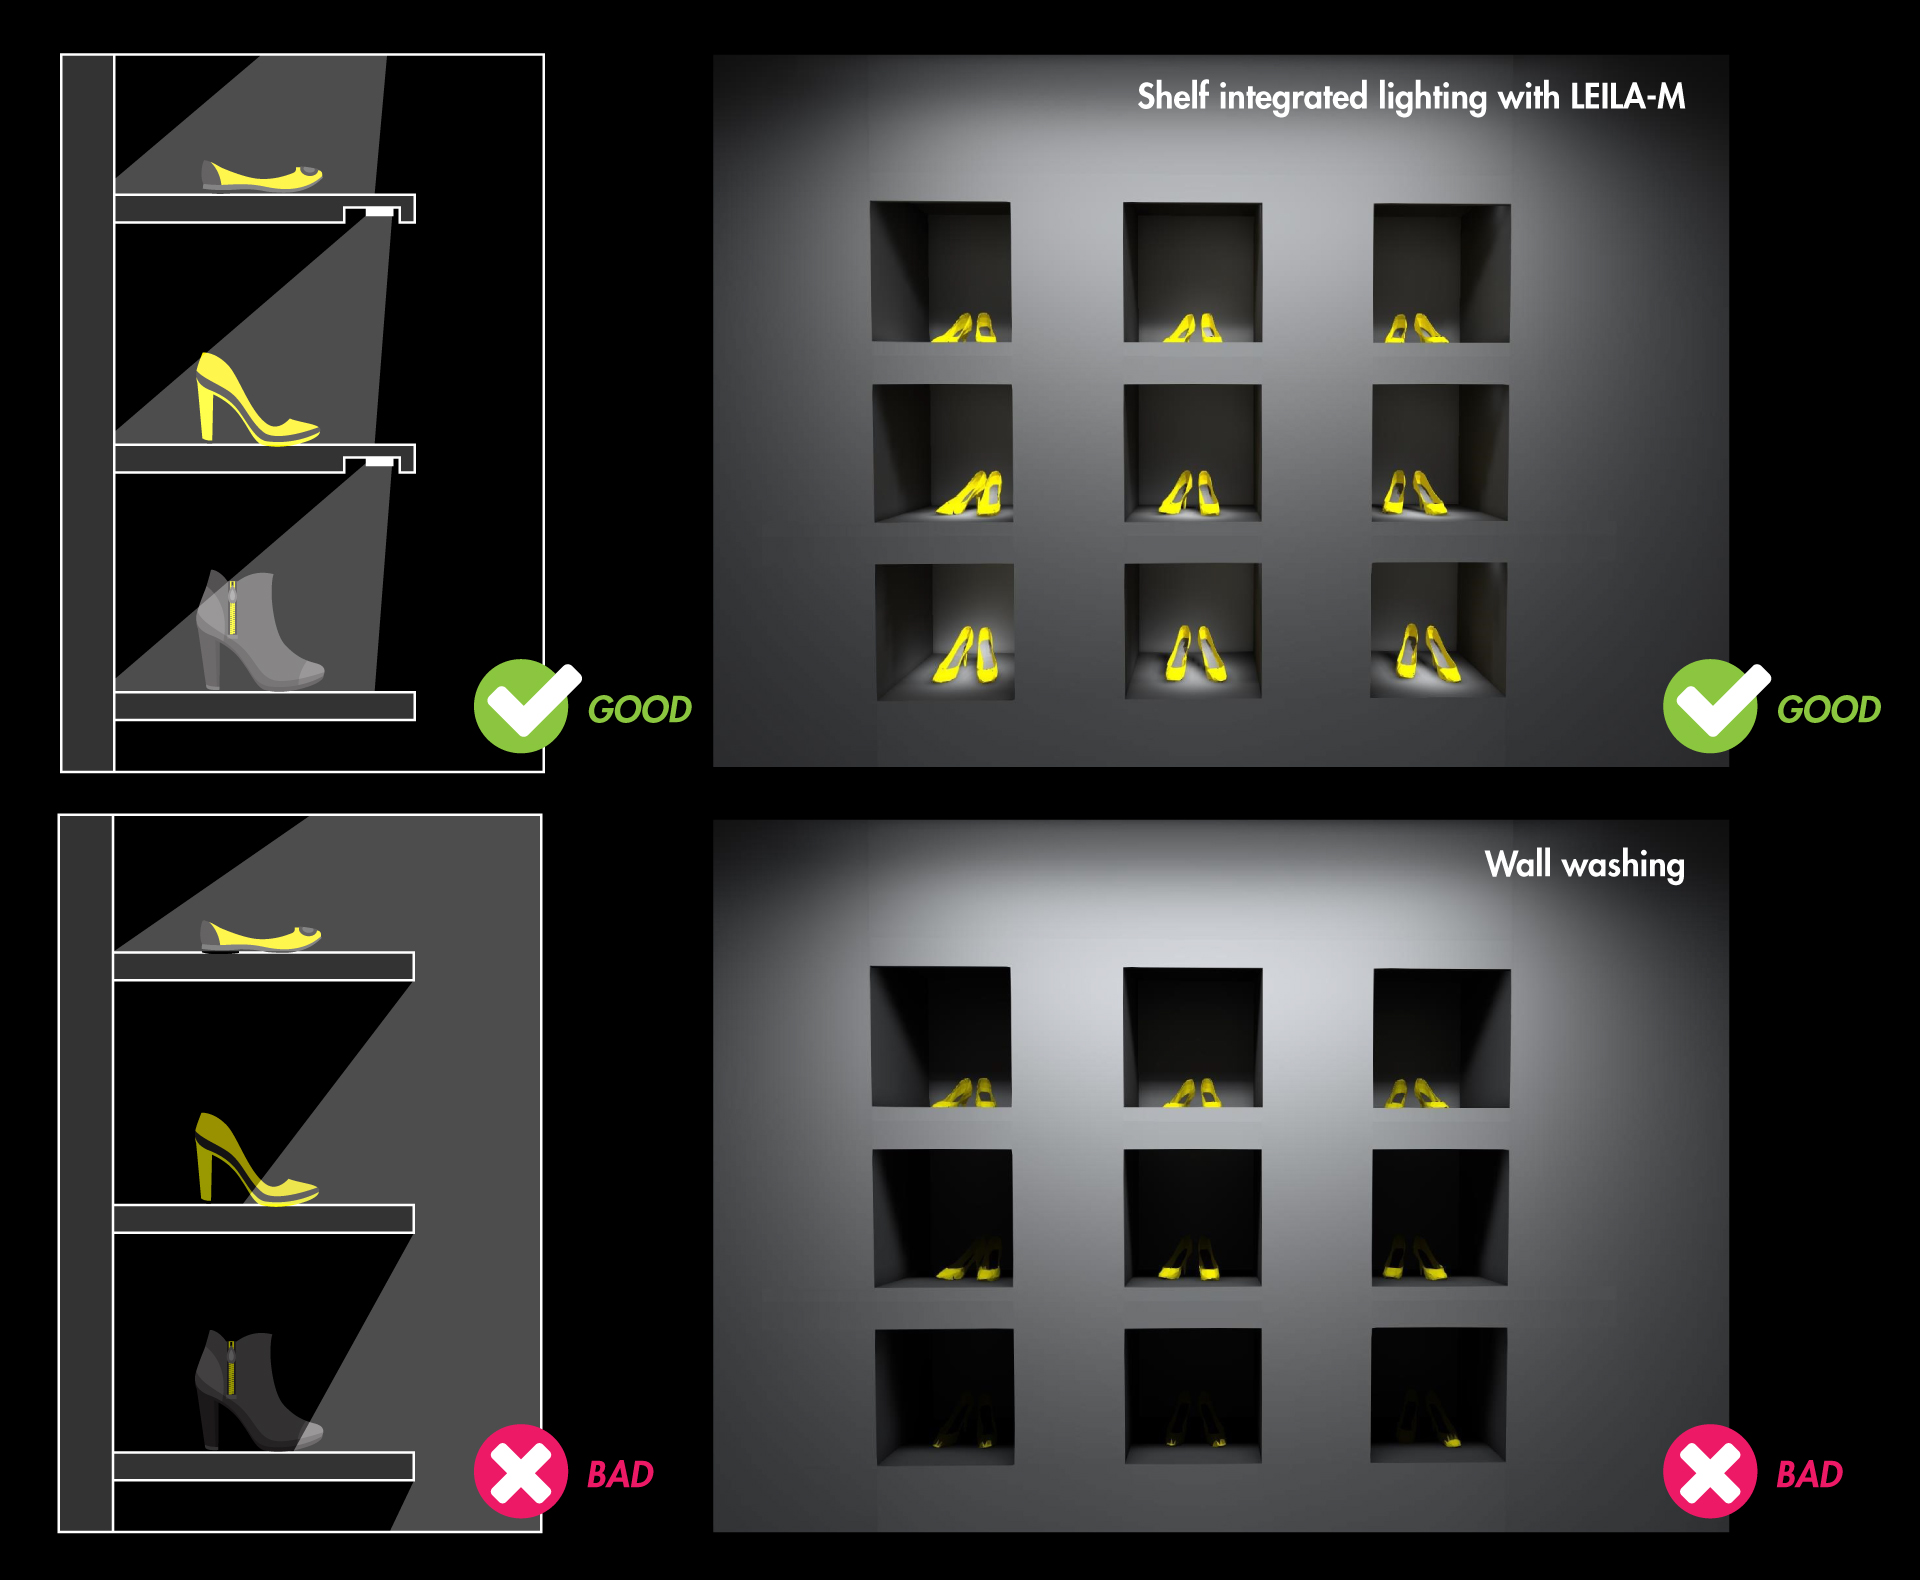 Integrated shelf lighting